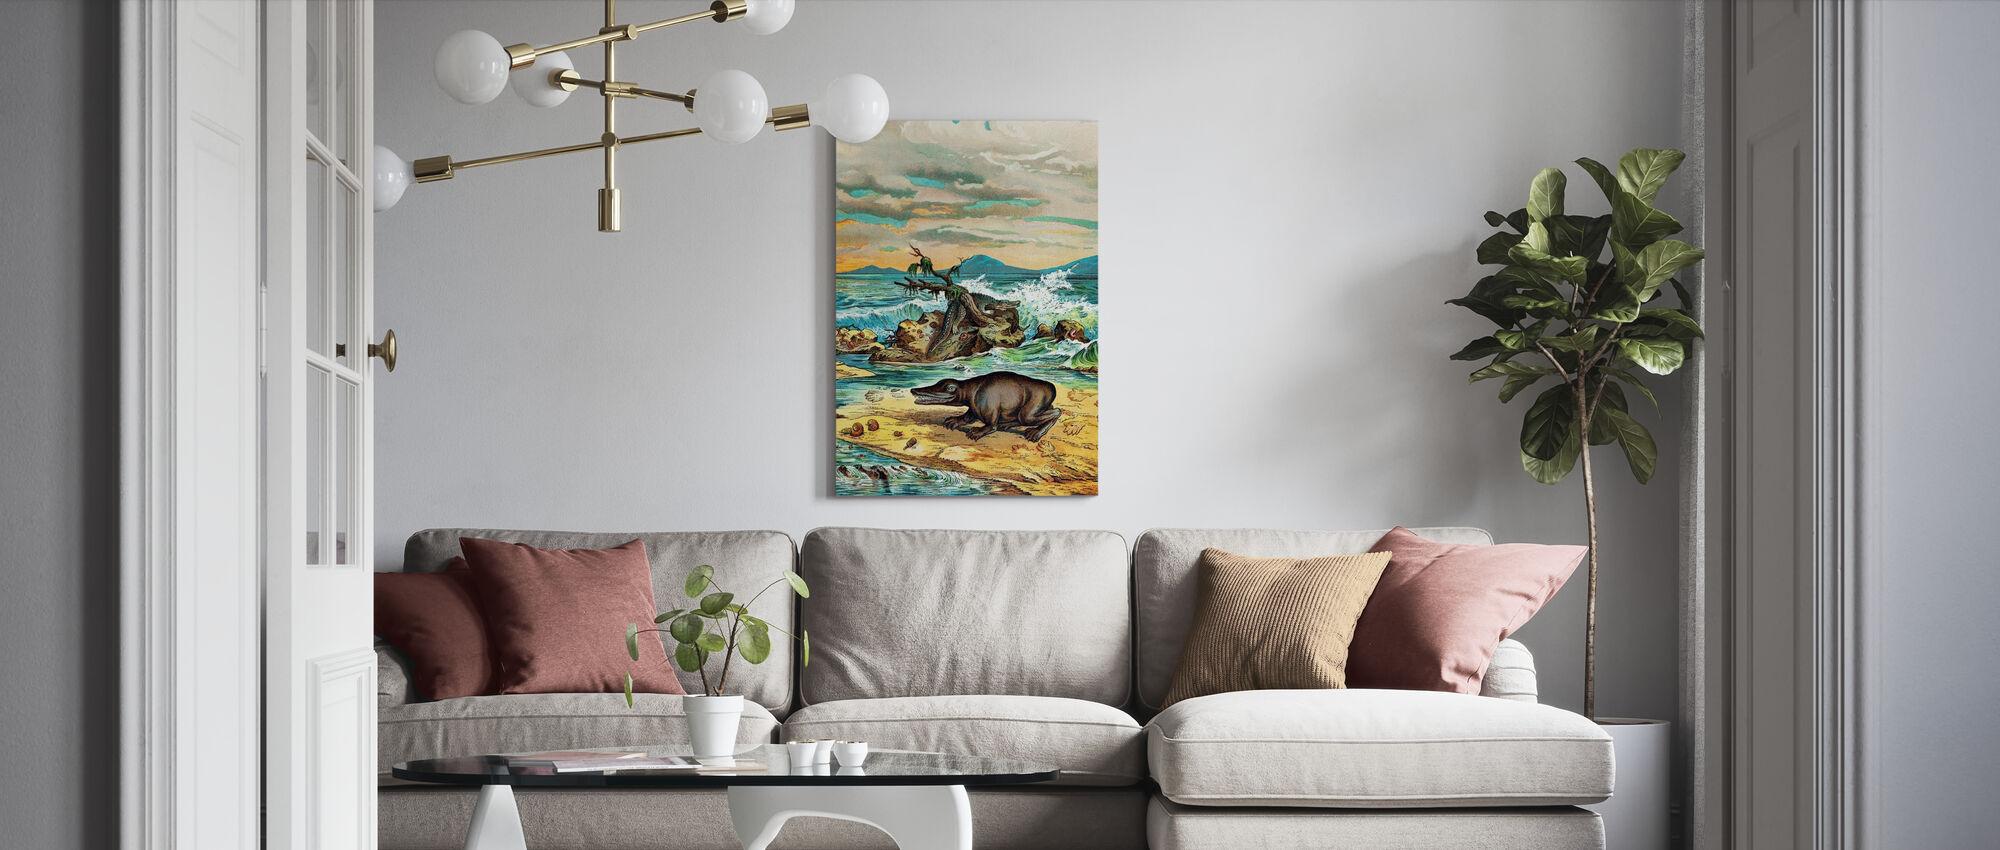 Triassic Coastal Environment - Canvas print - Living Room